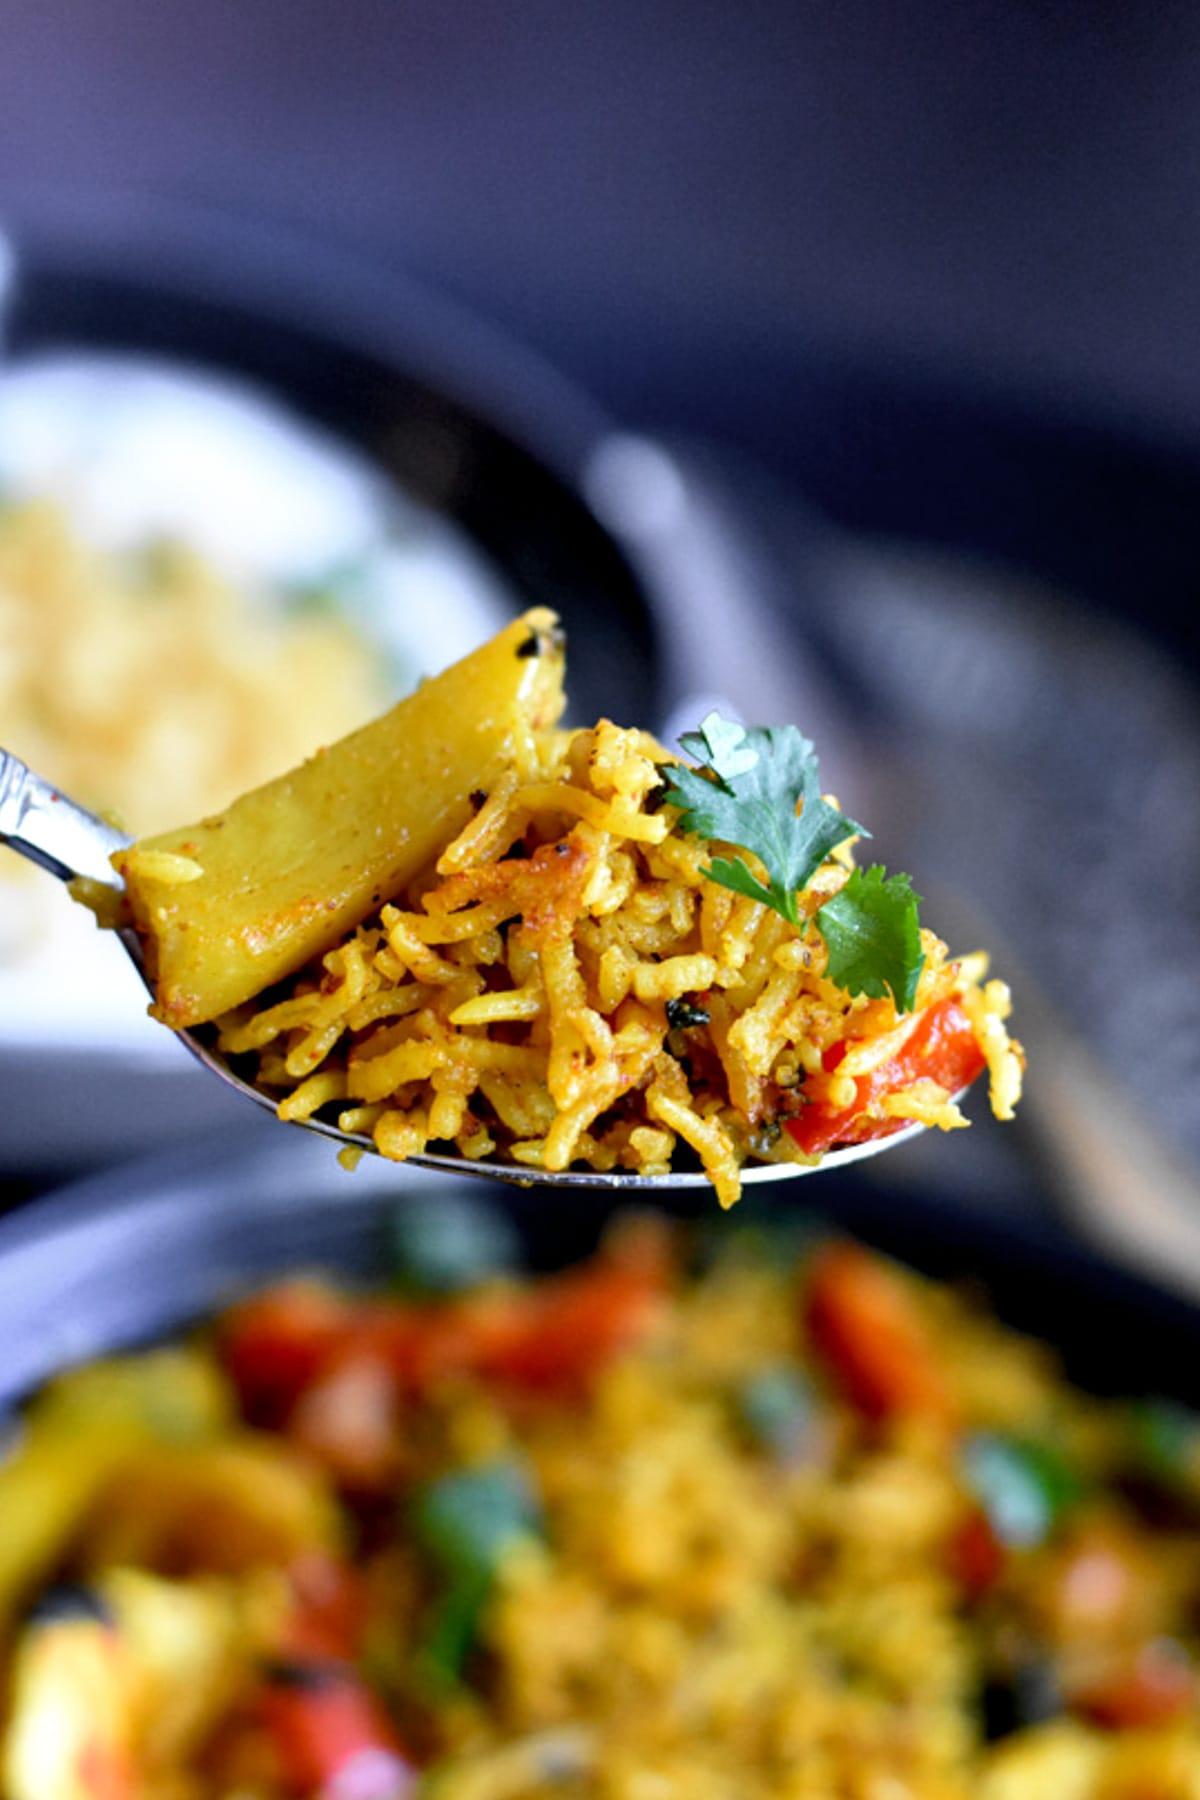 A spoon full of Indian Vegetable Biryani